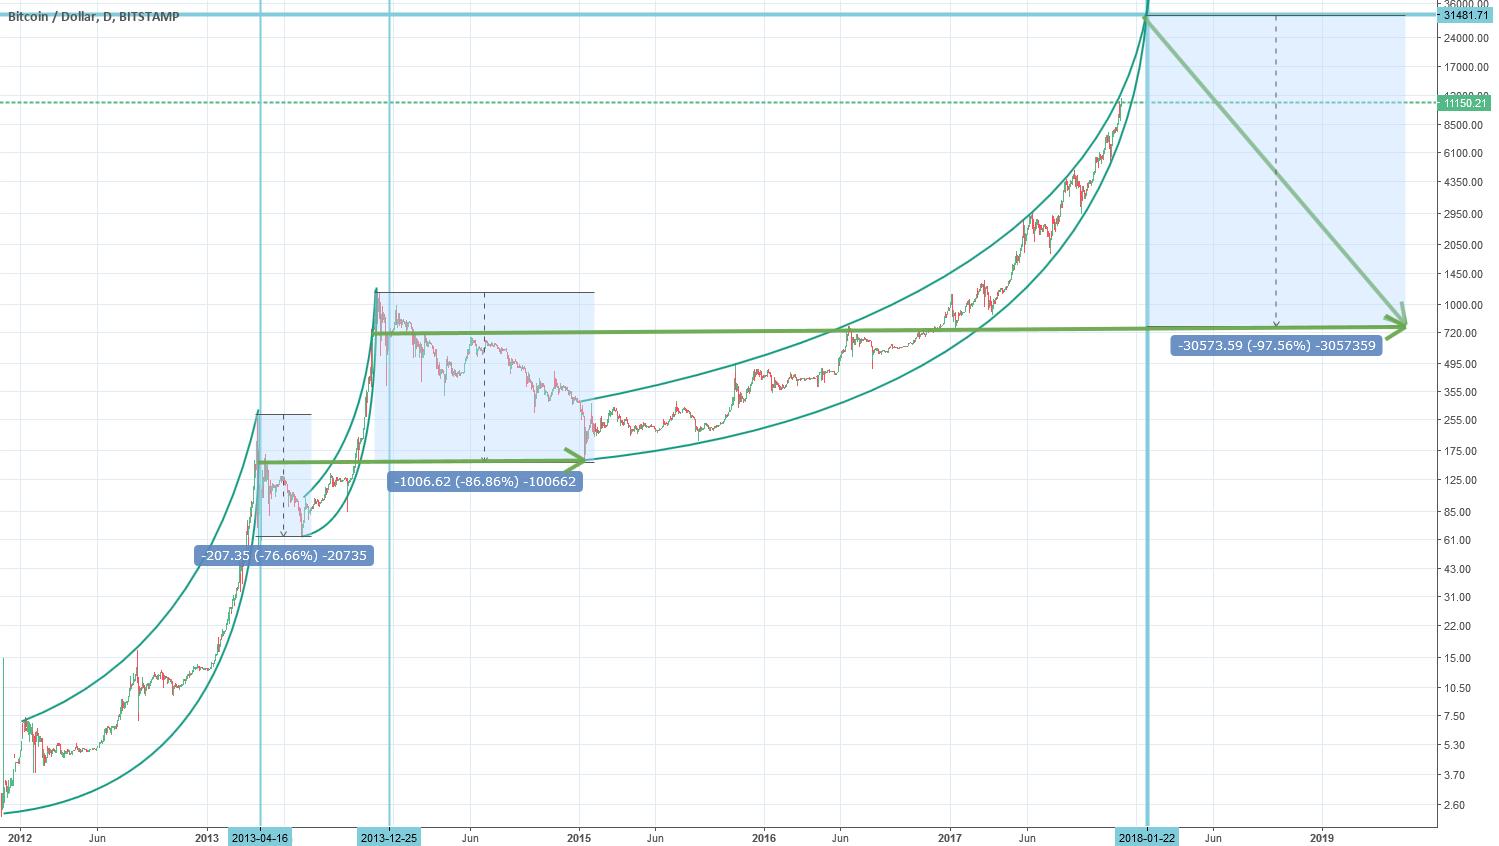 BTCUSD Below $1000 after Reaching parabolic maximum at 30000